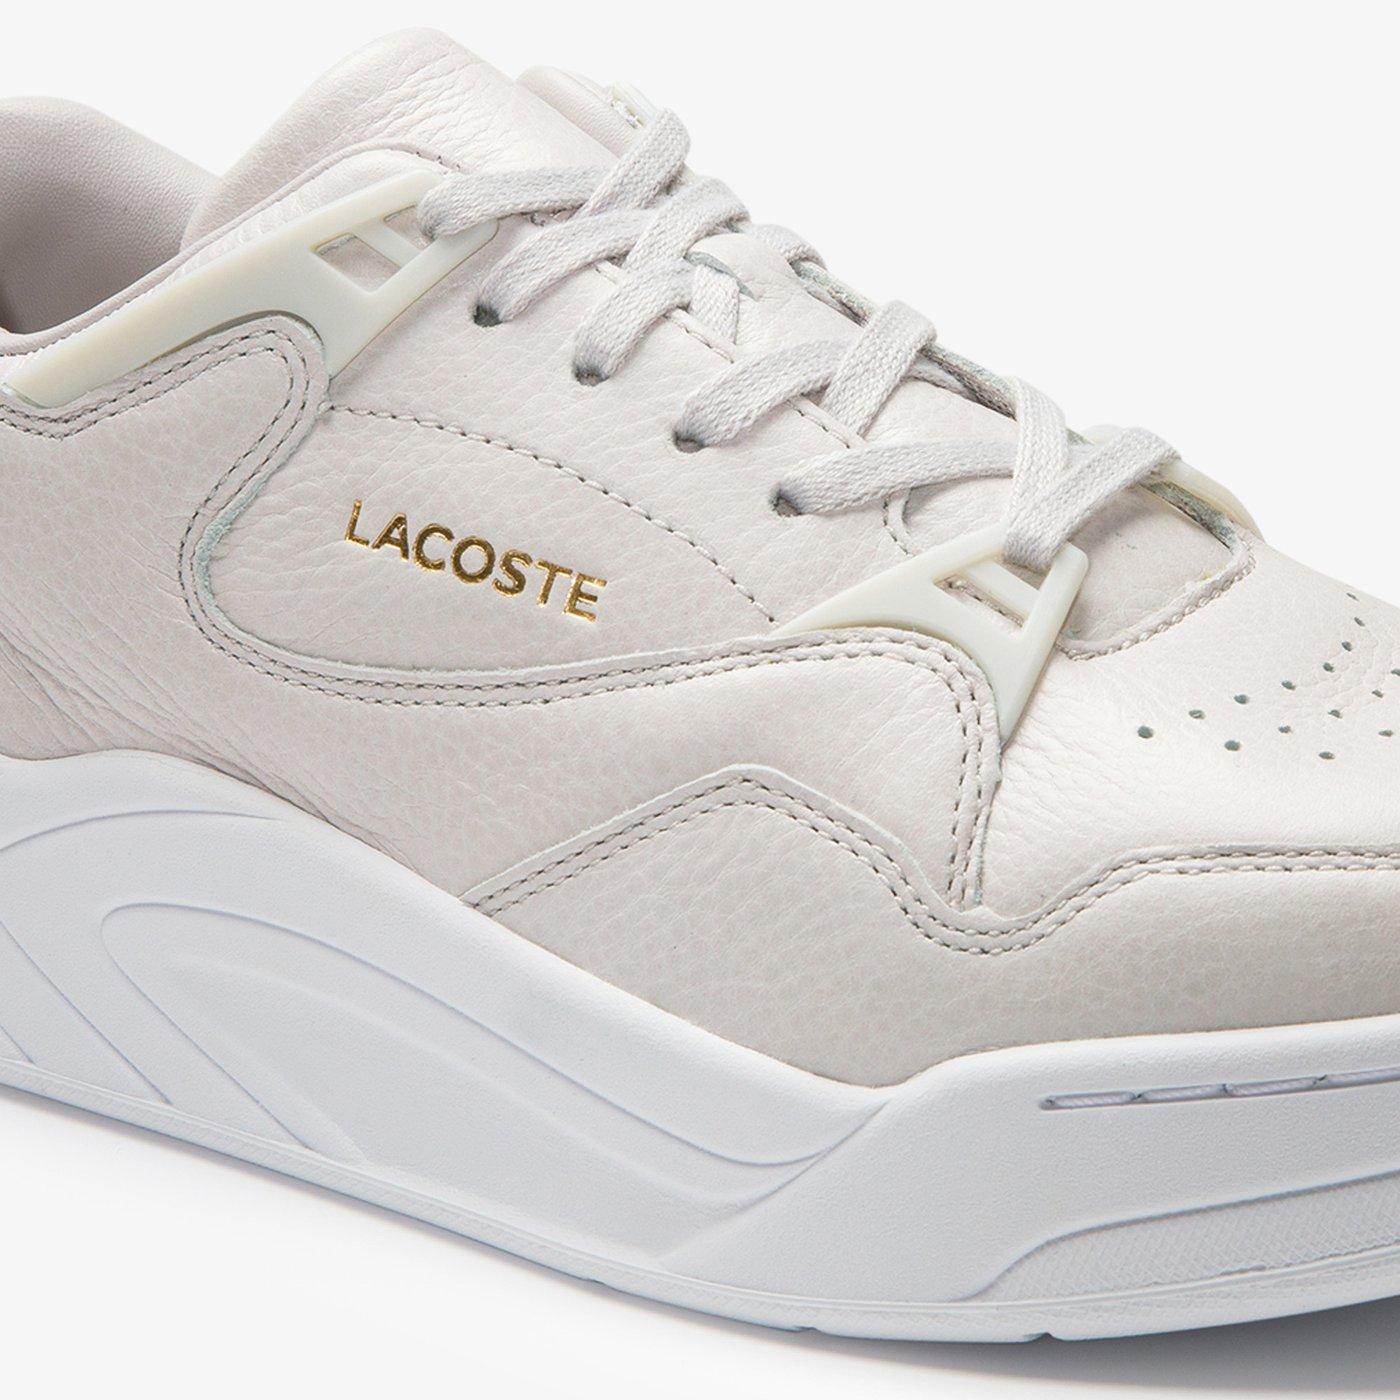 Кросівки жіночі Lacoste COURT SLAM